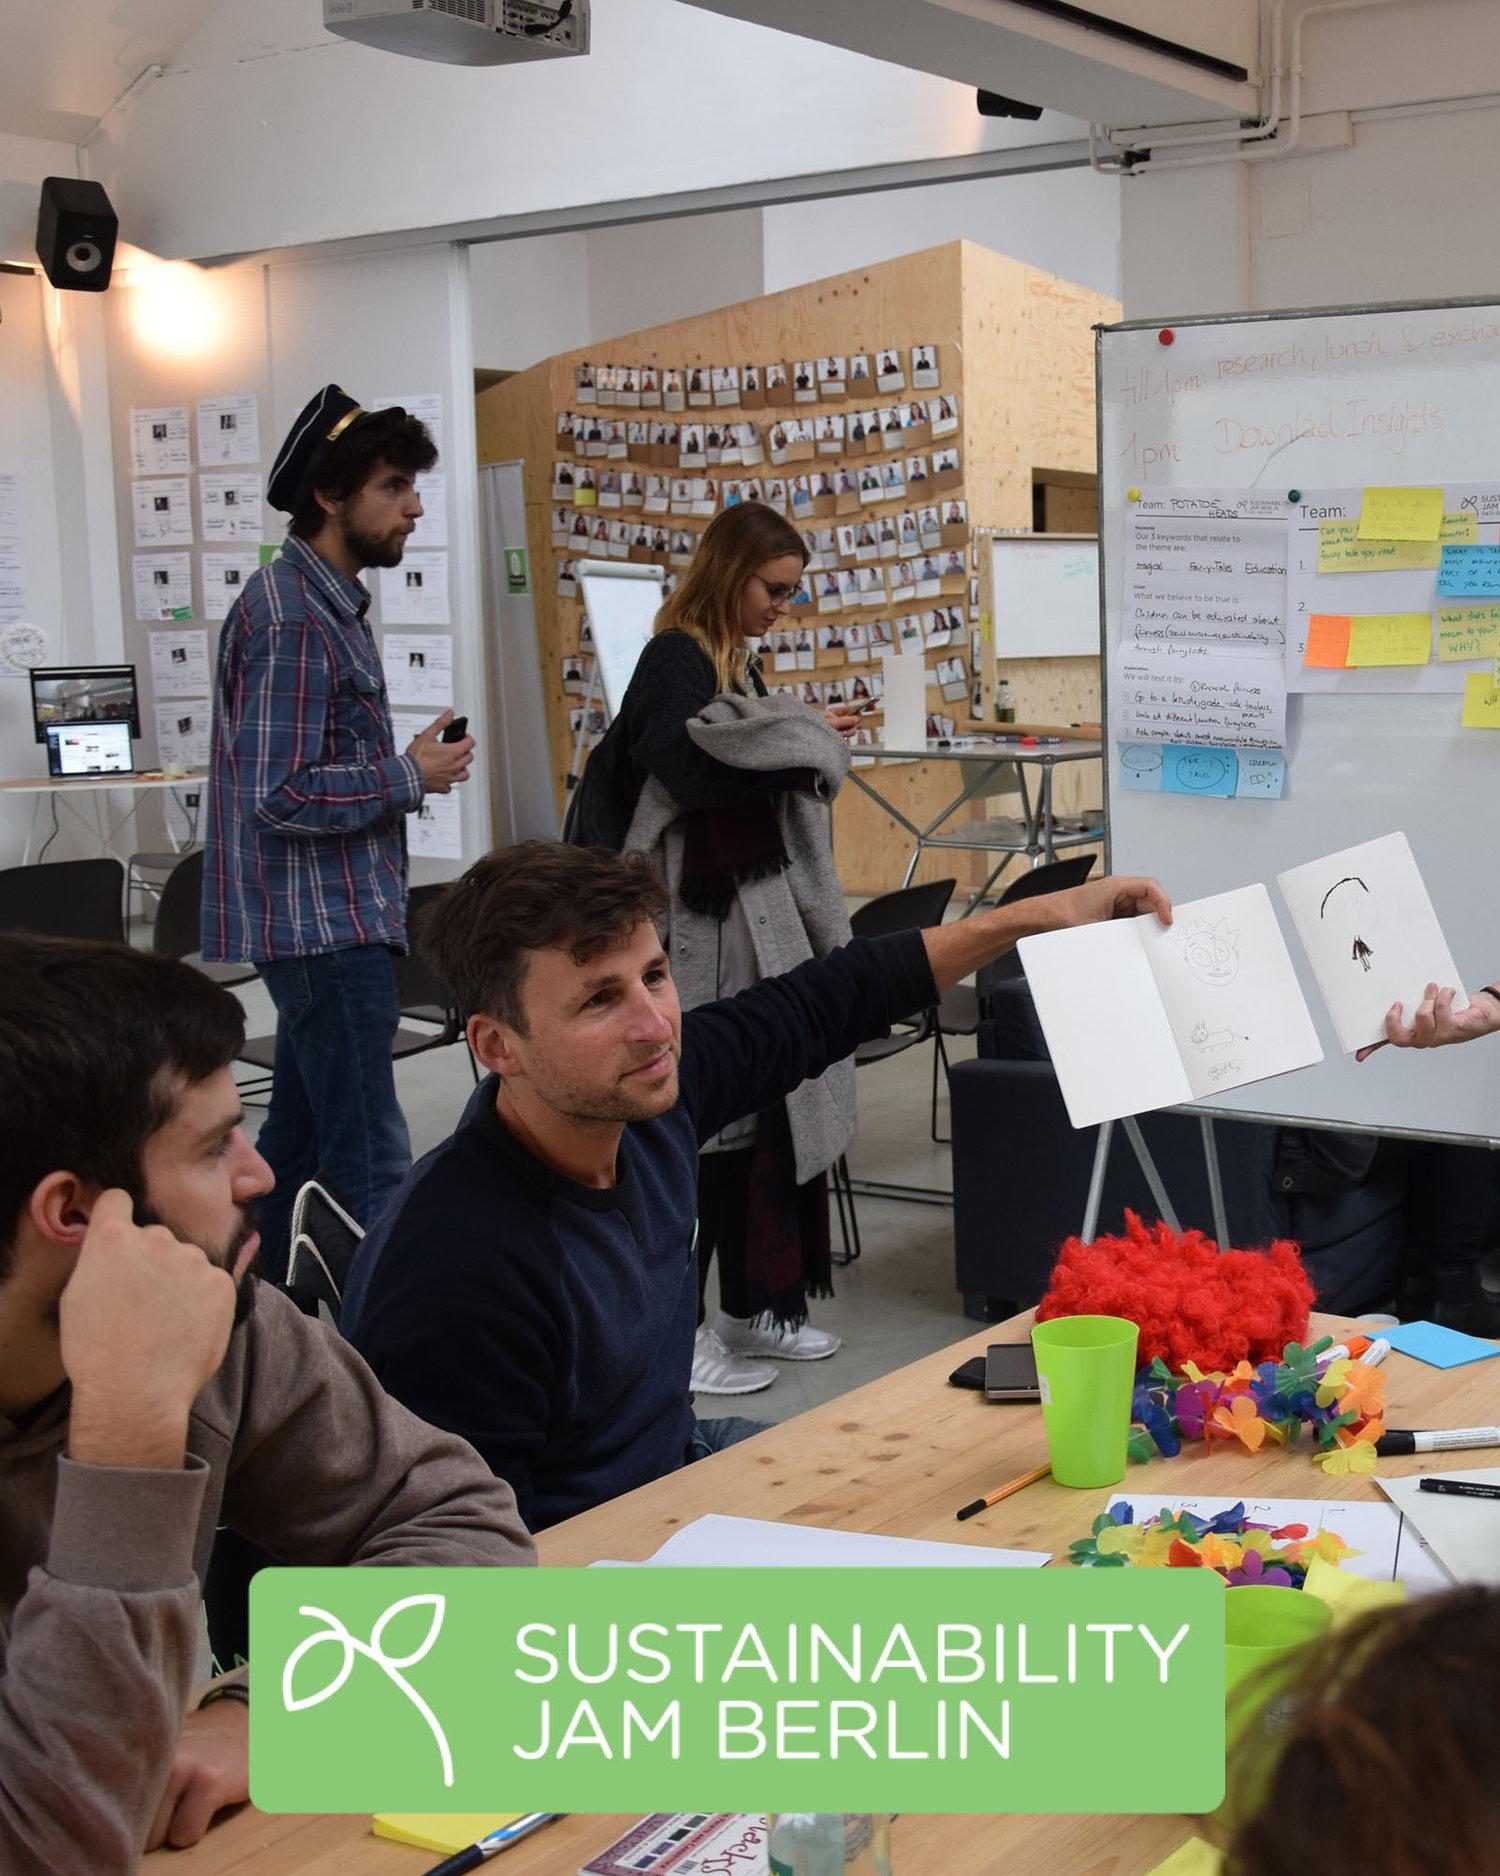 Sustainability Jam Berlin